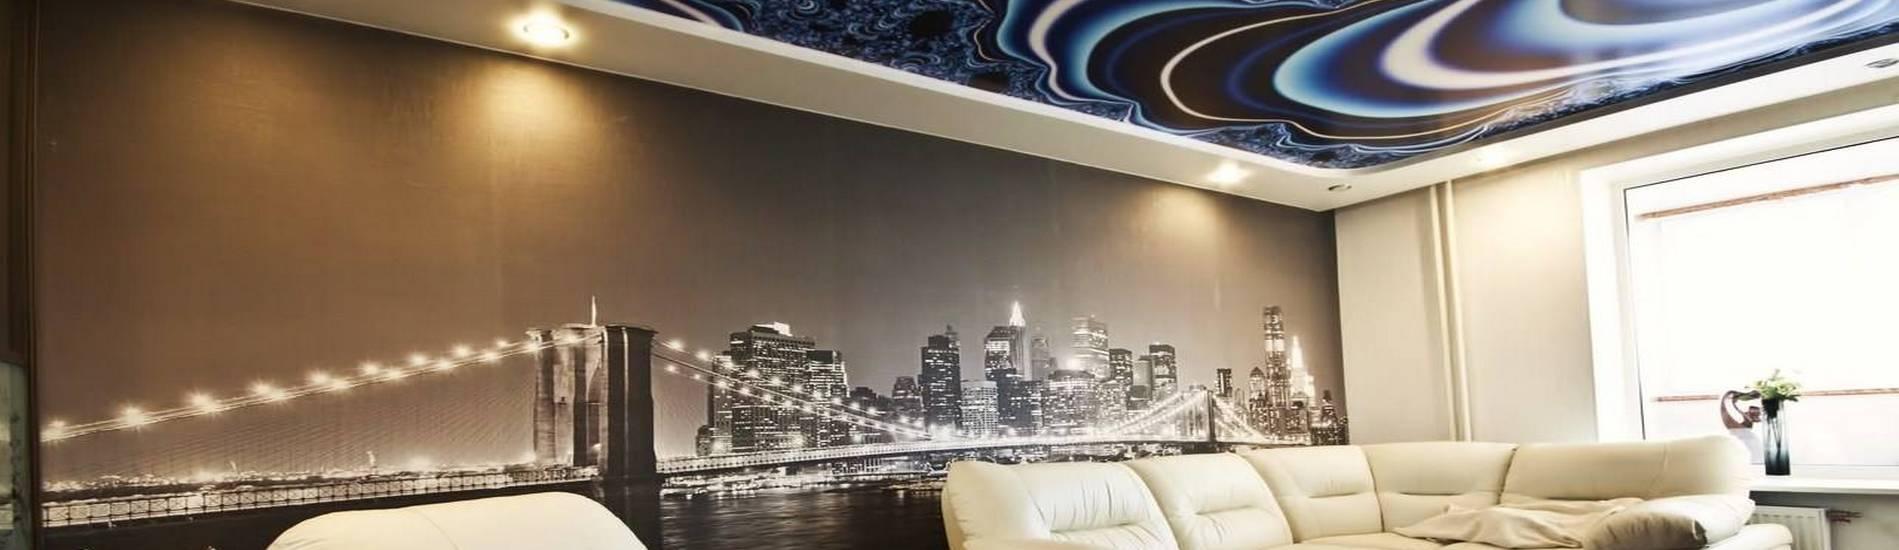 Plafond & mur imprimés